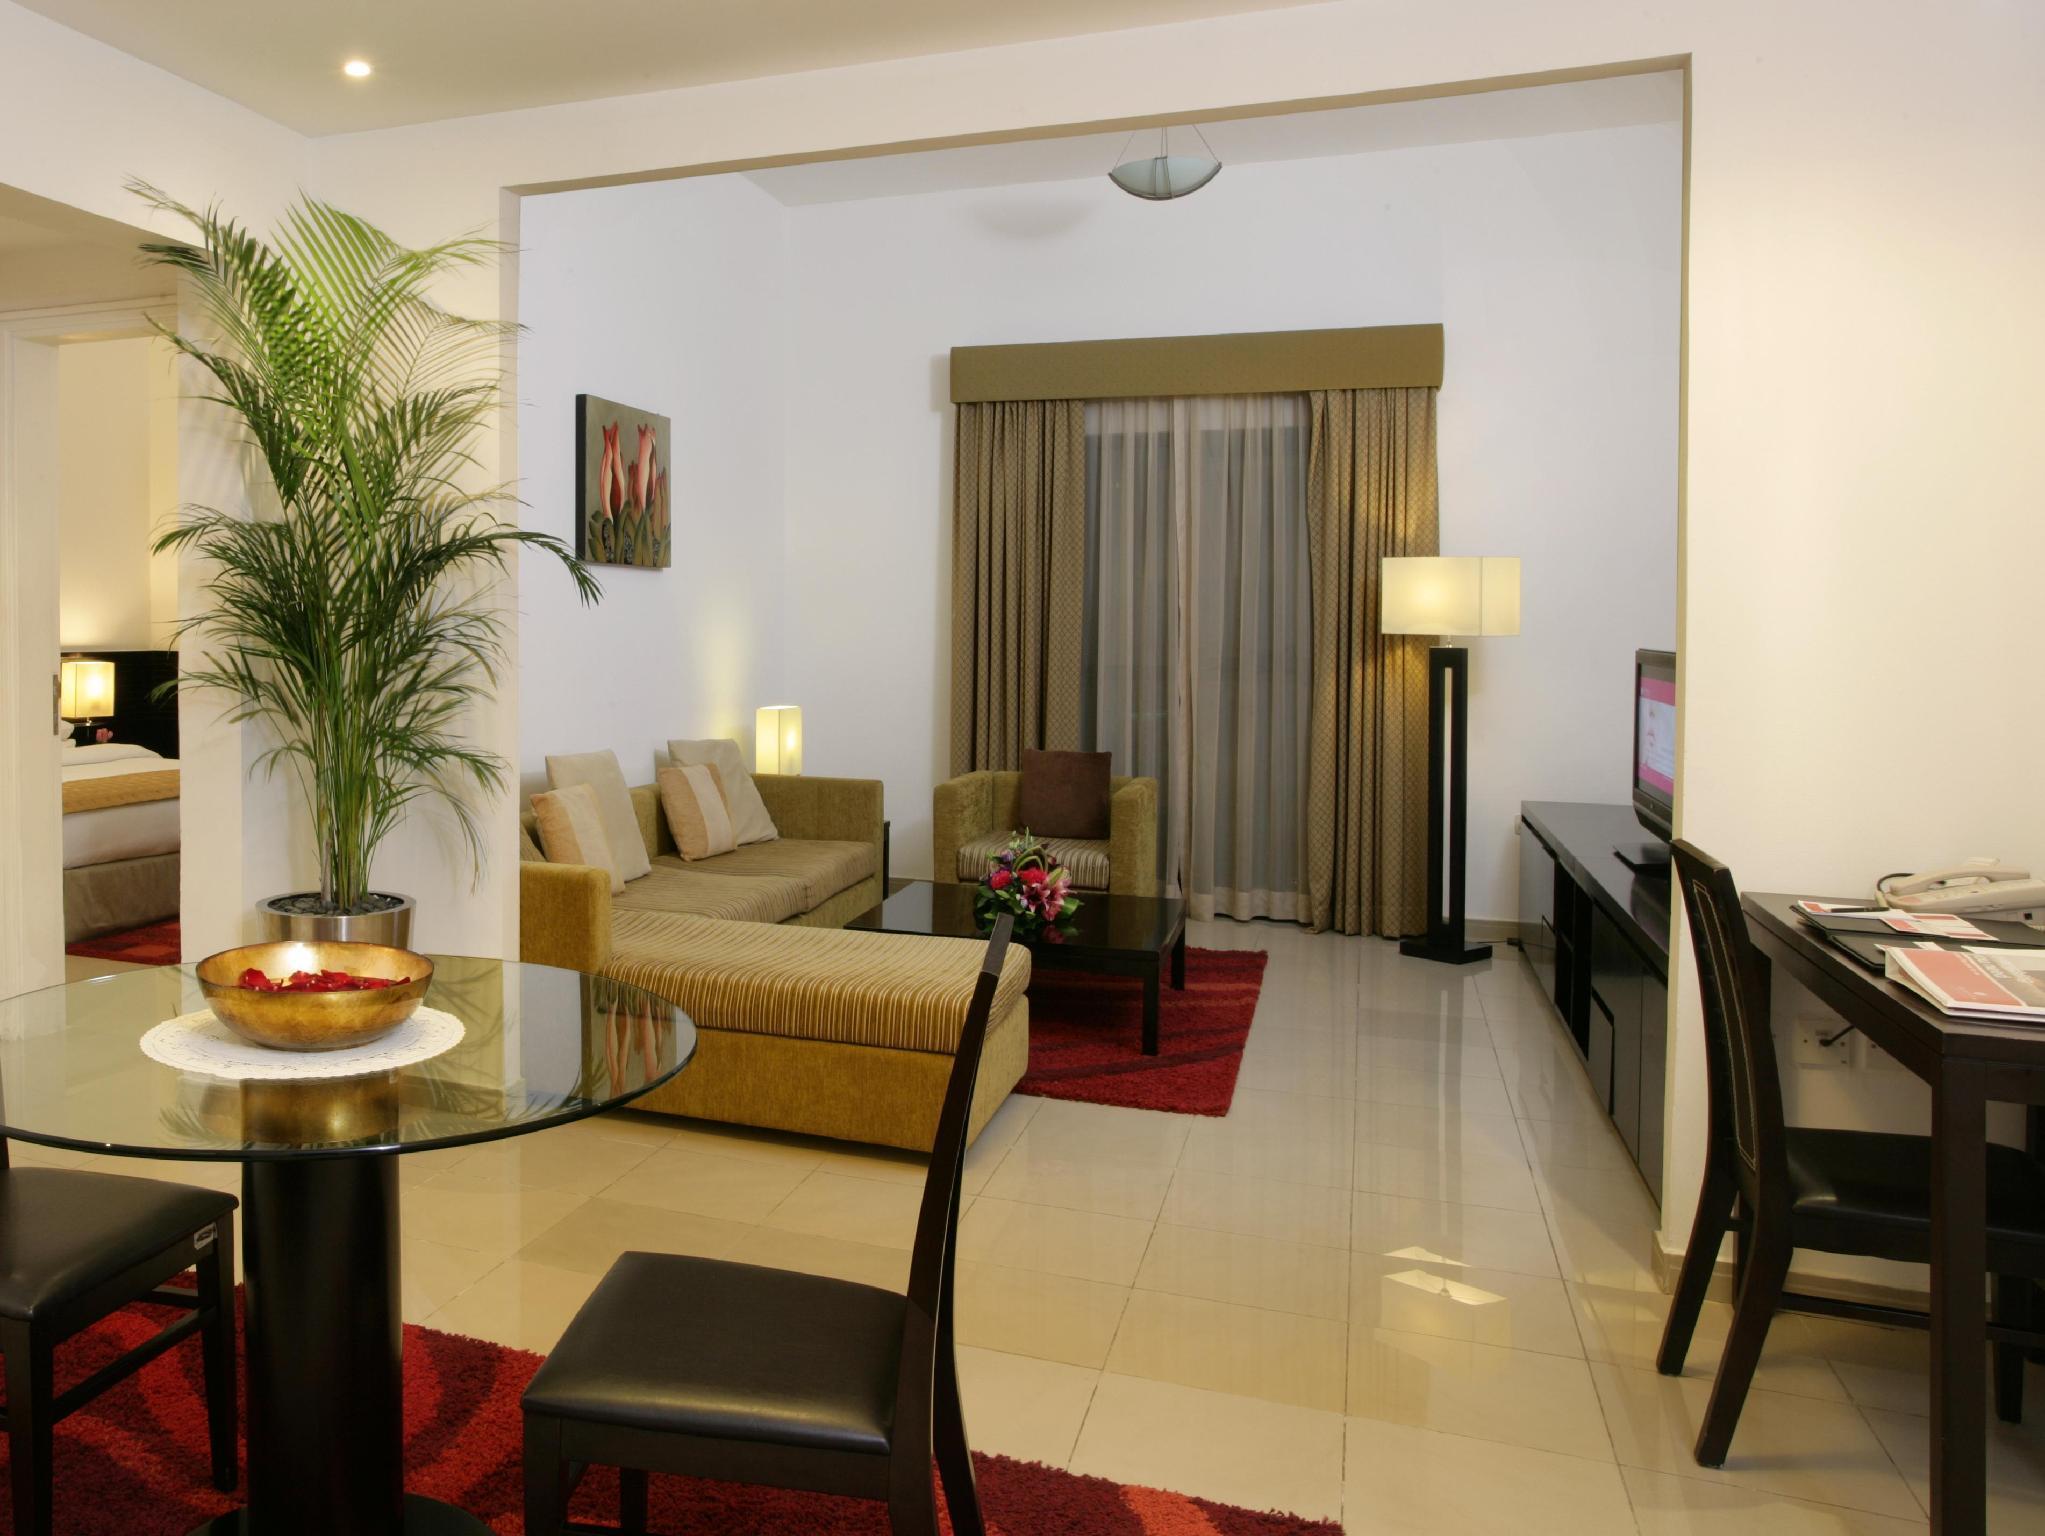 Ramada Hotel & Suites Ajman, Ajman - Boek een aanbieding op Agoda.com